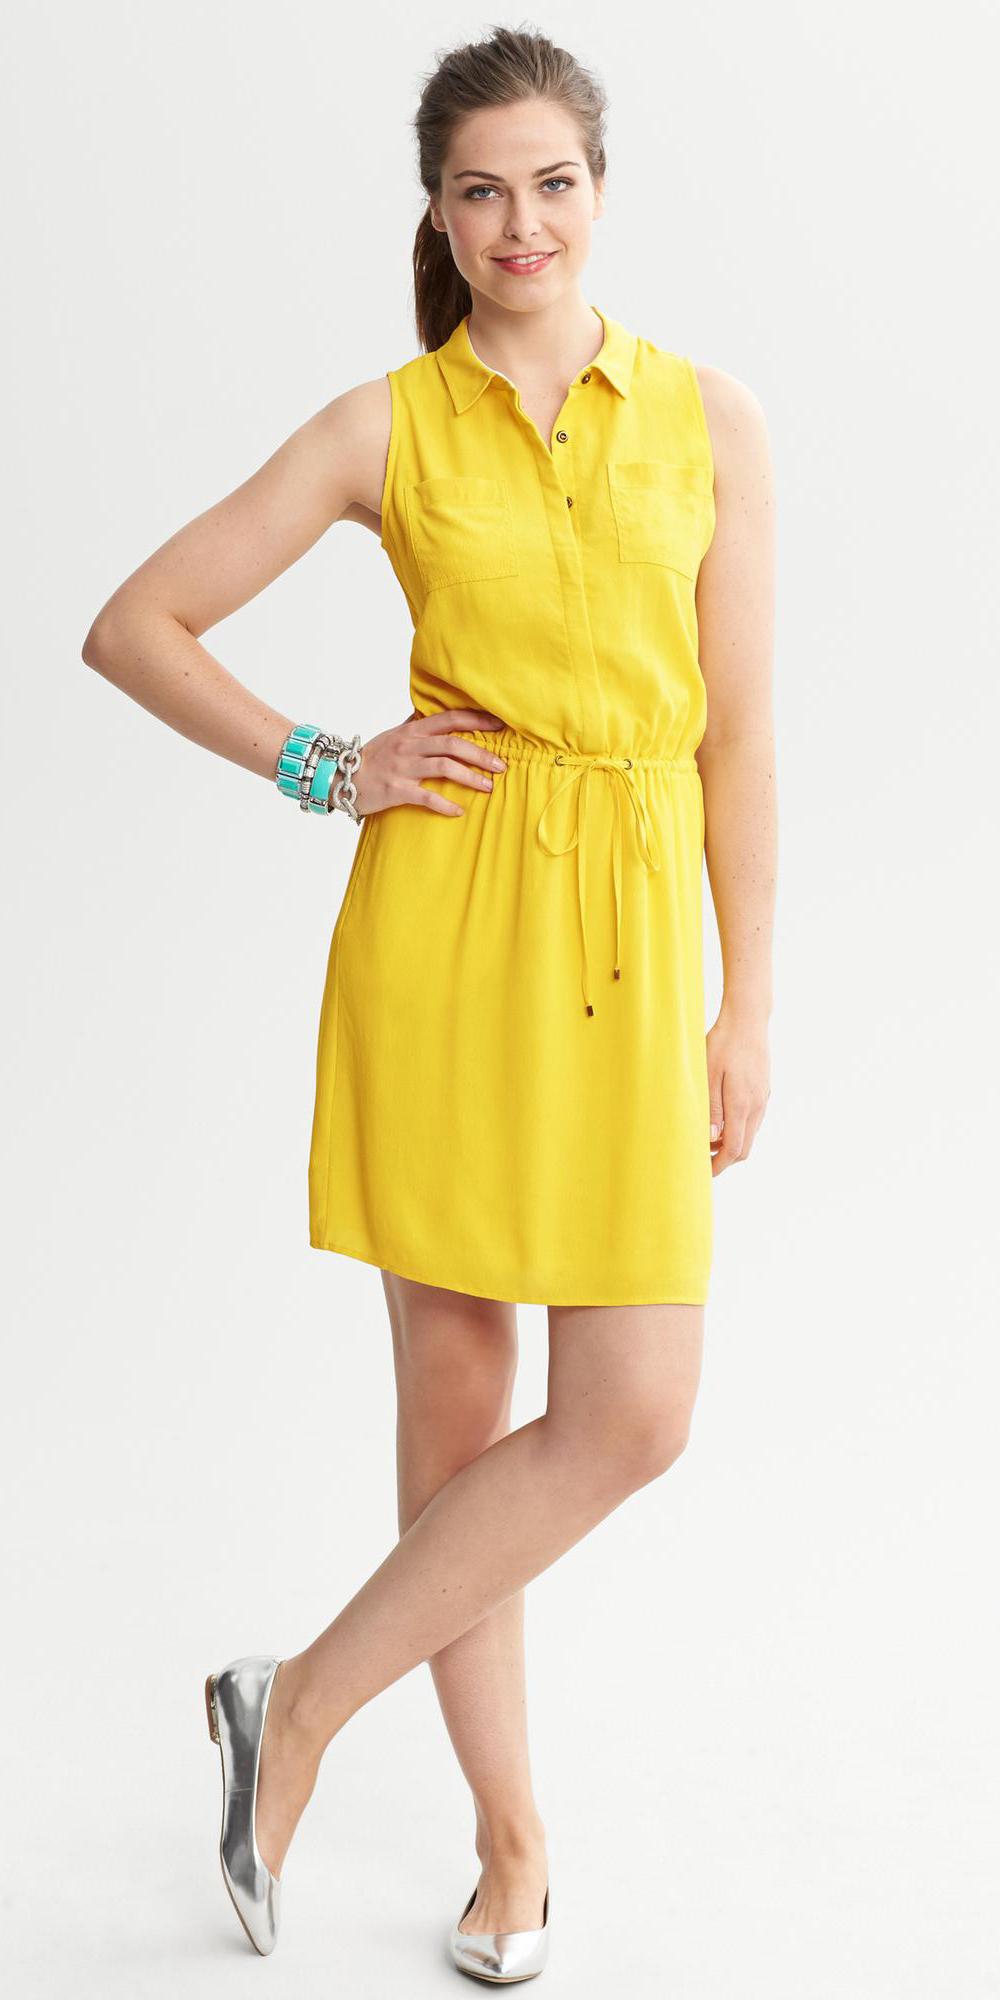 yellow-dress-a-gray-shoe-flats-bracelet-turquoise-pony-shirt-wear-style-fashion-spring-summer-hairr-lunch.jpeg